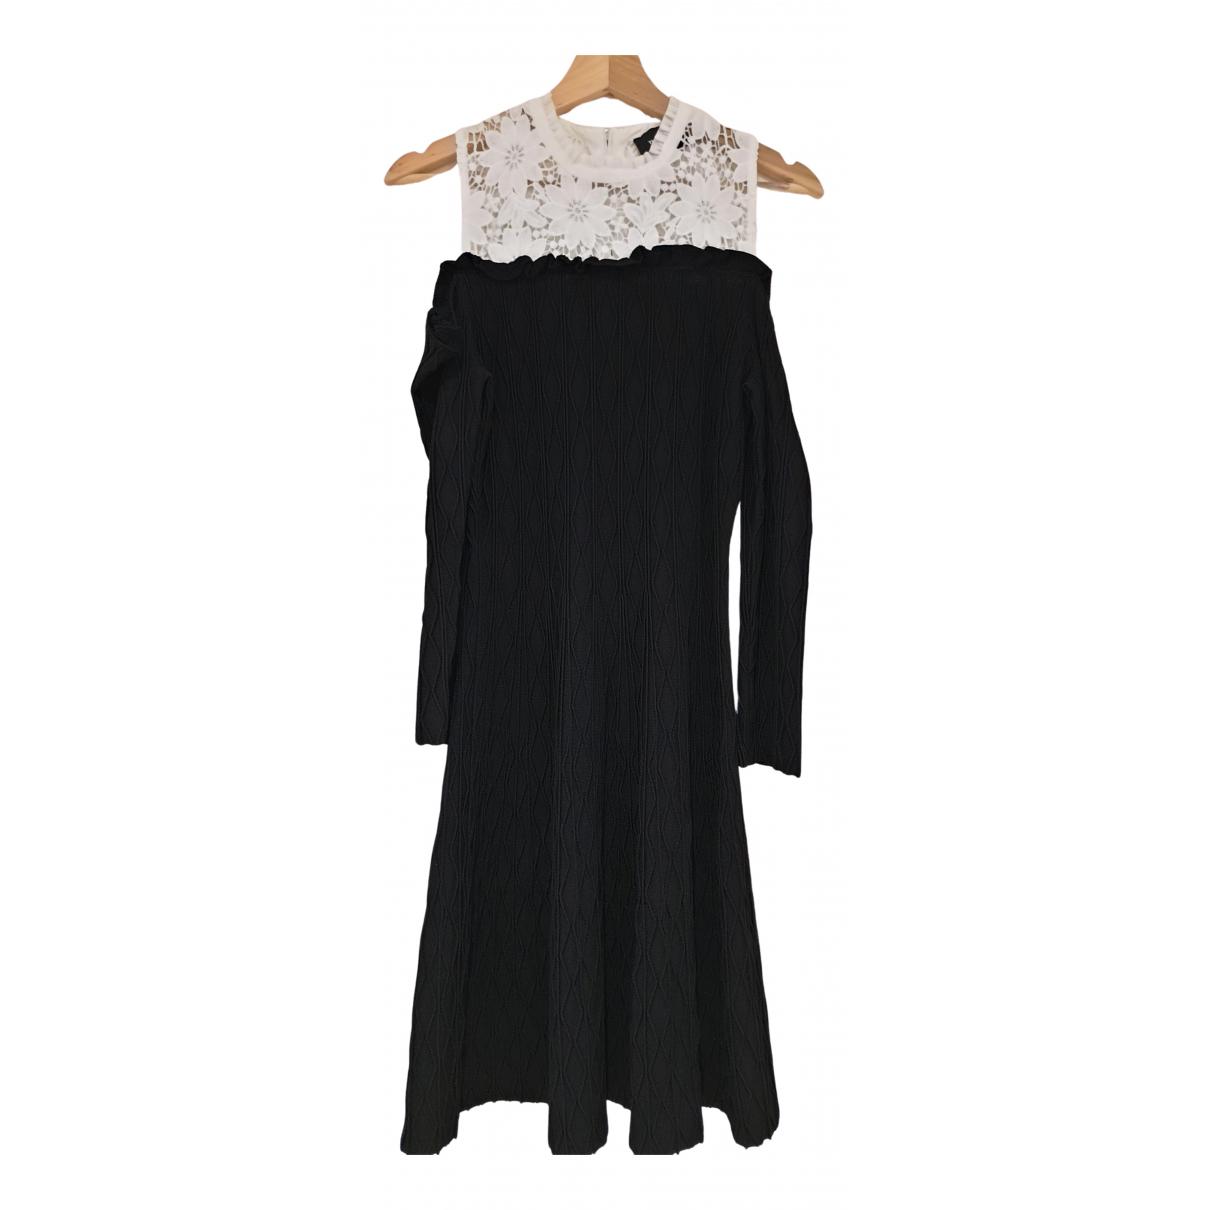 The Kooples \N Multicolour dress for Women 2 0-5